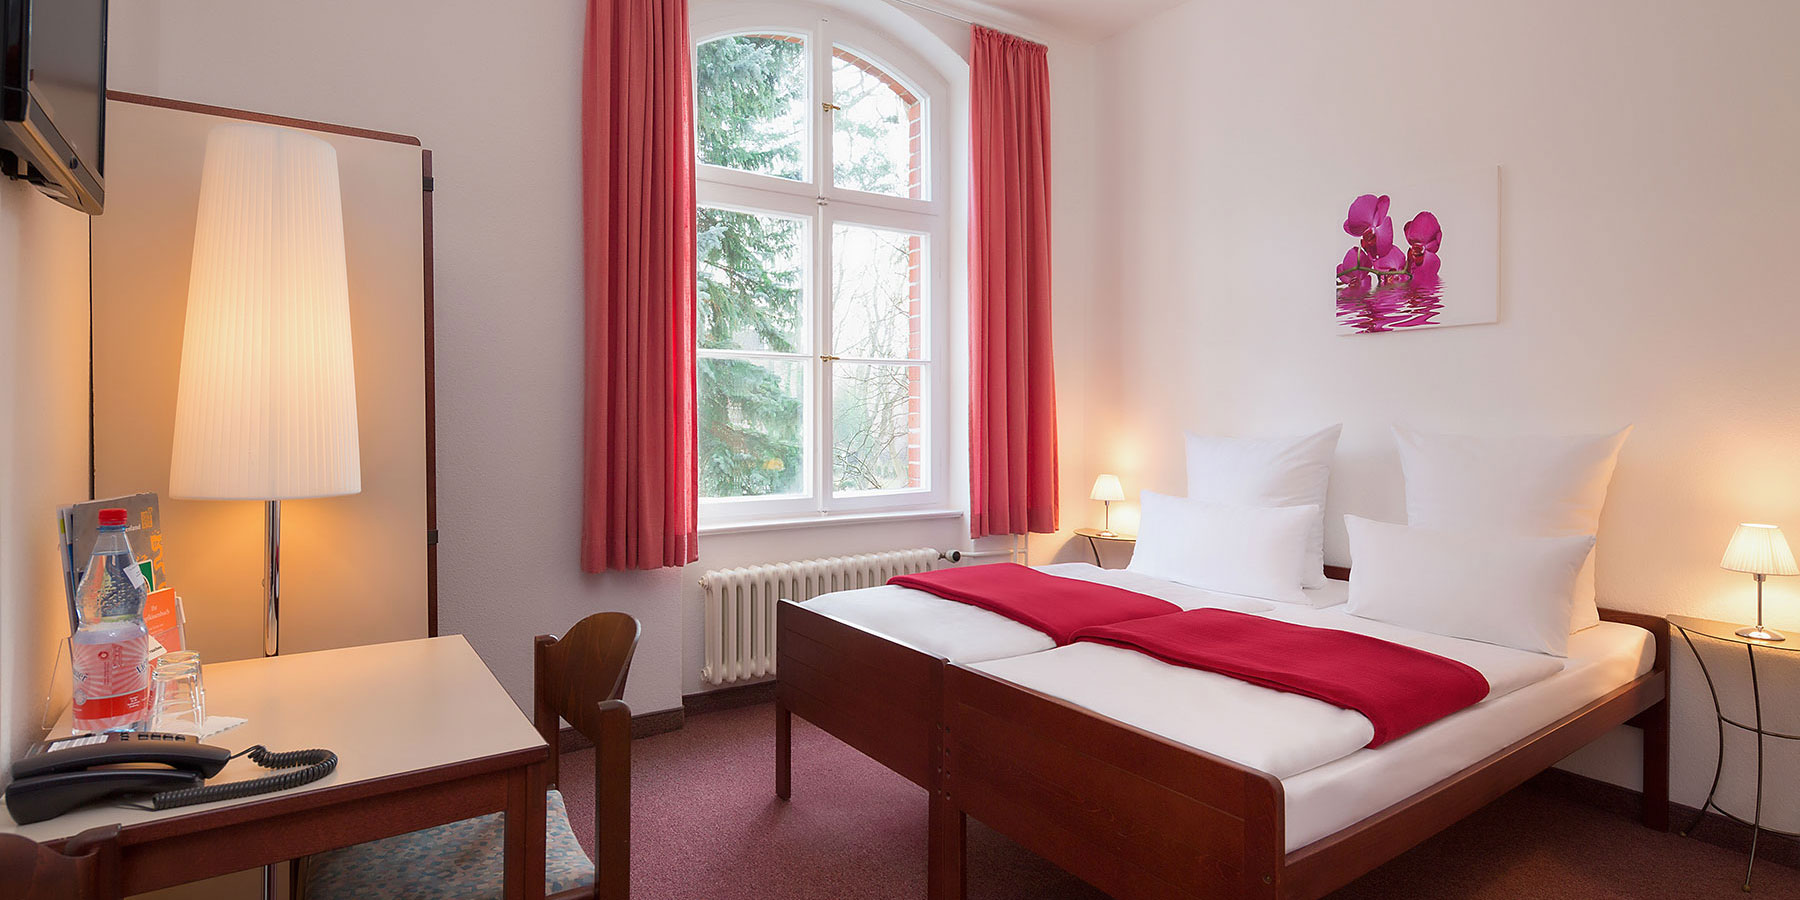 Doppelzimmer Altbau